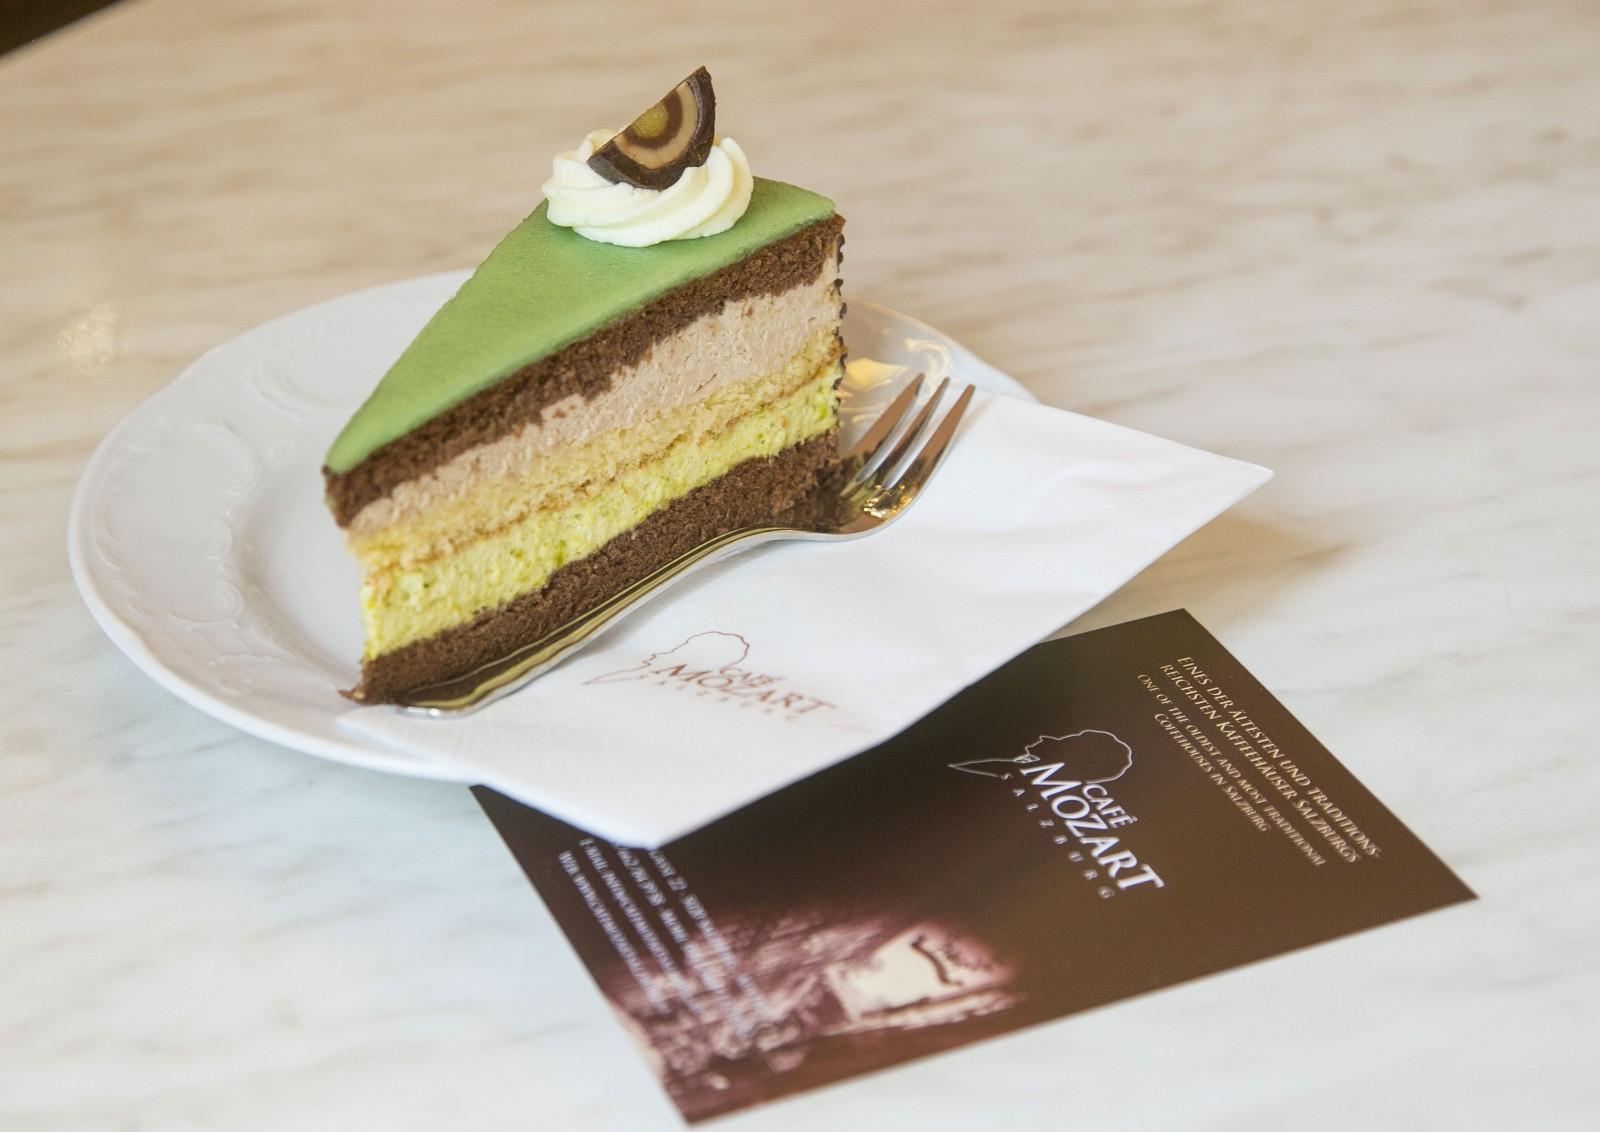 Mozarttorte, Cafe Mozart